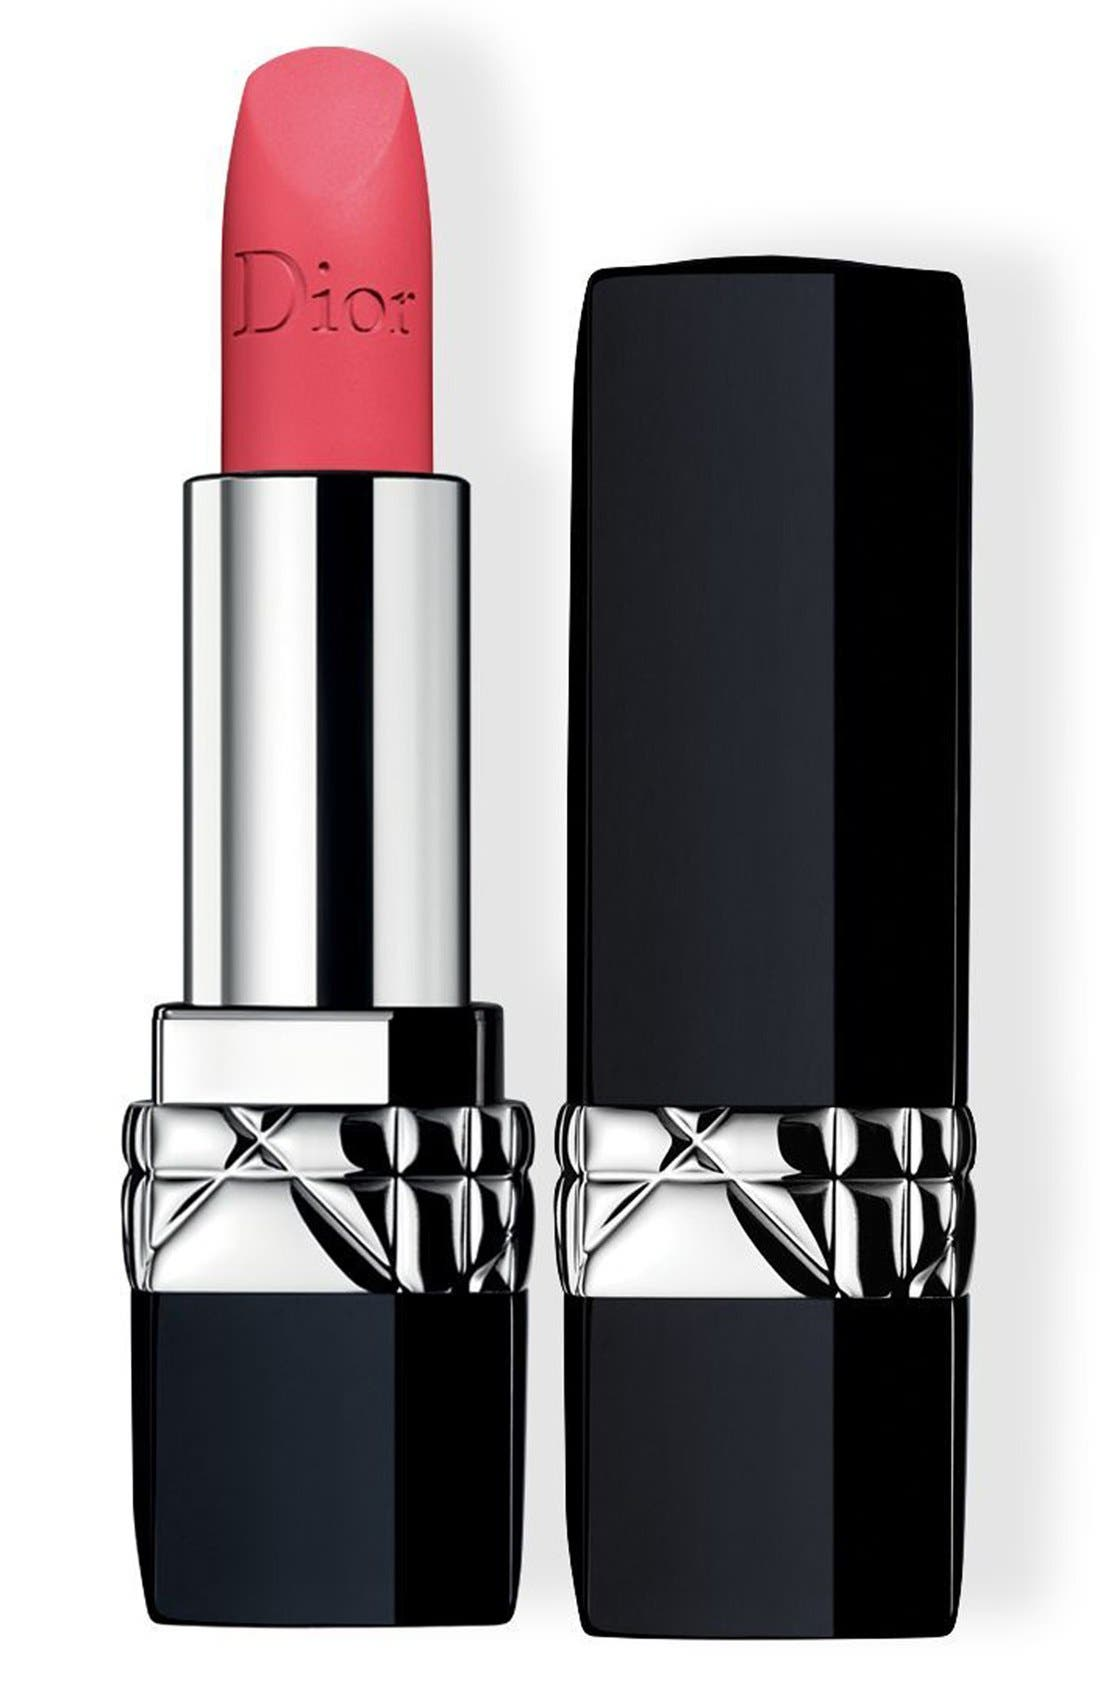 Dior Couture Color Rouge Dior Lipstick - 771 Radiant Matte